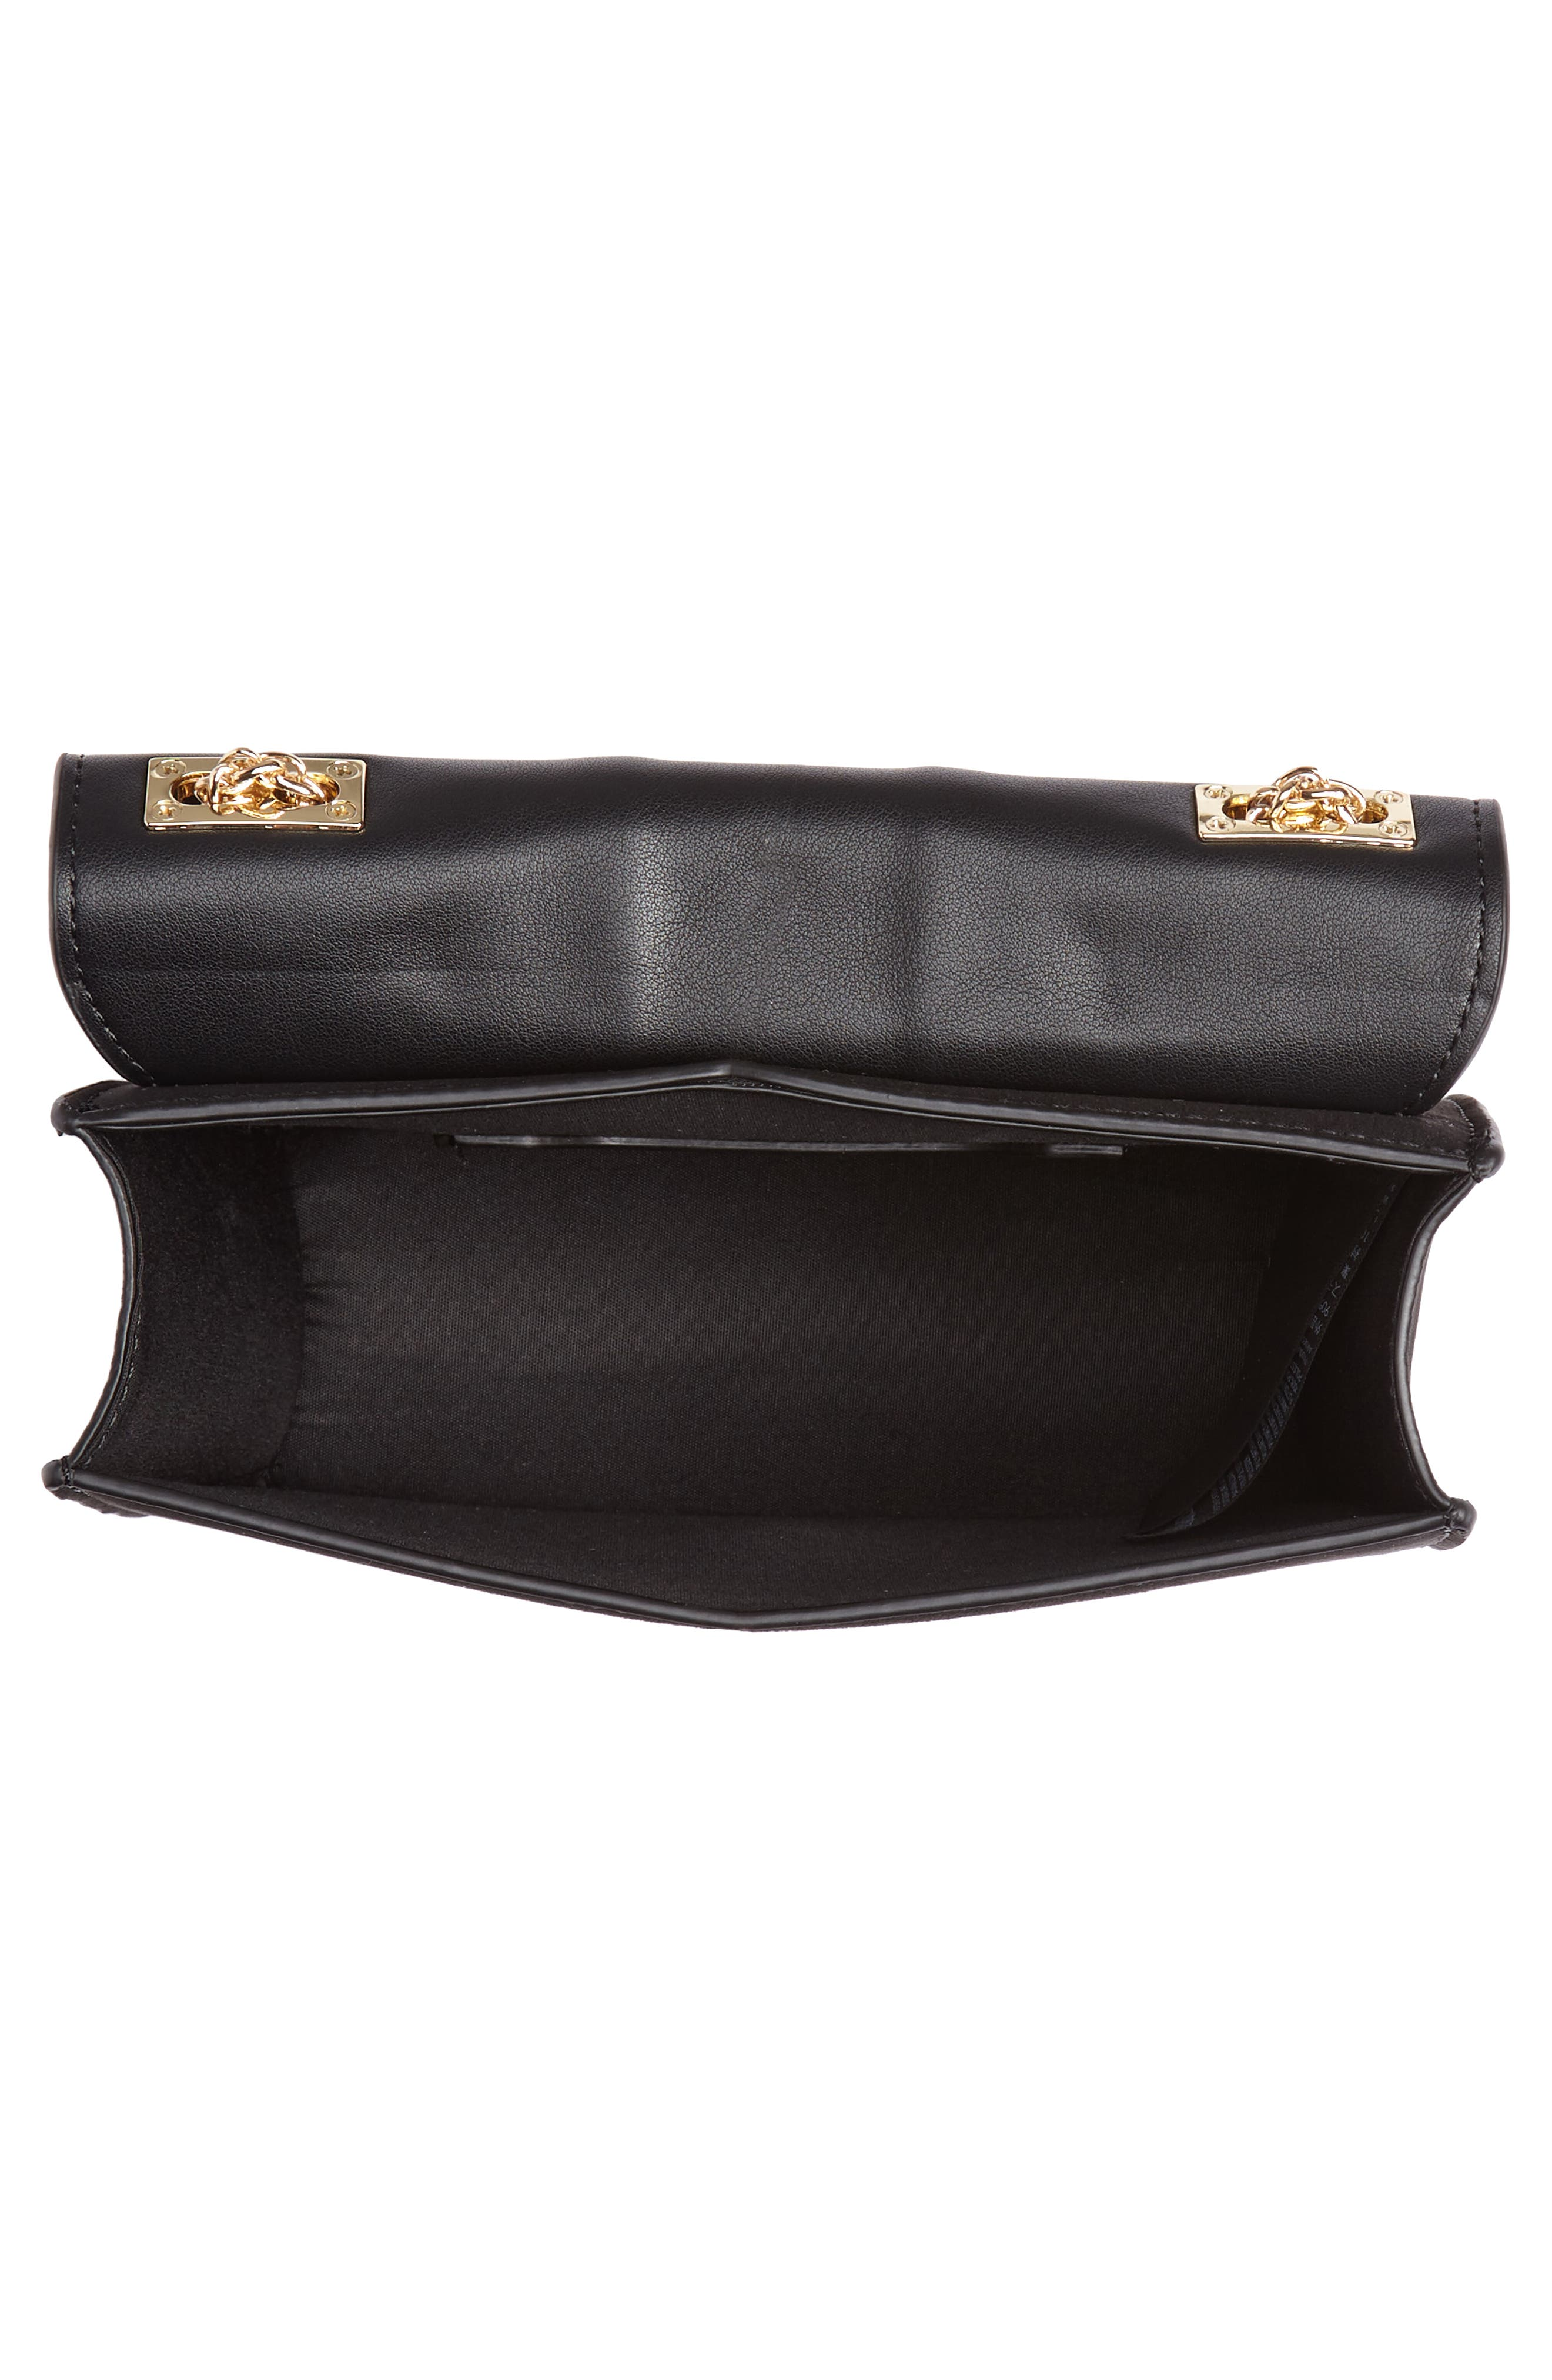 Panther Crossbody Bag,                             Alternate thumbnail 4, color,                             BLACK